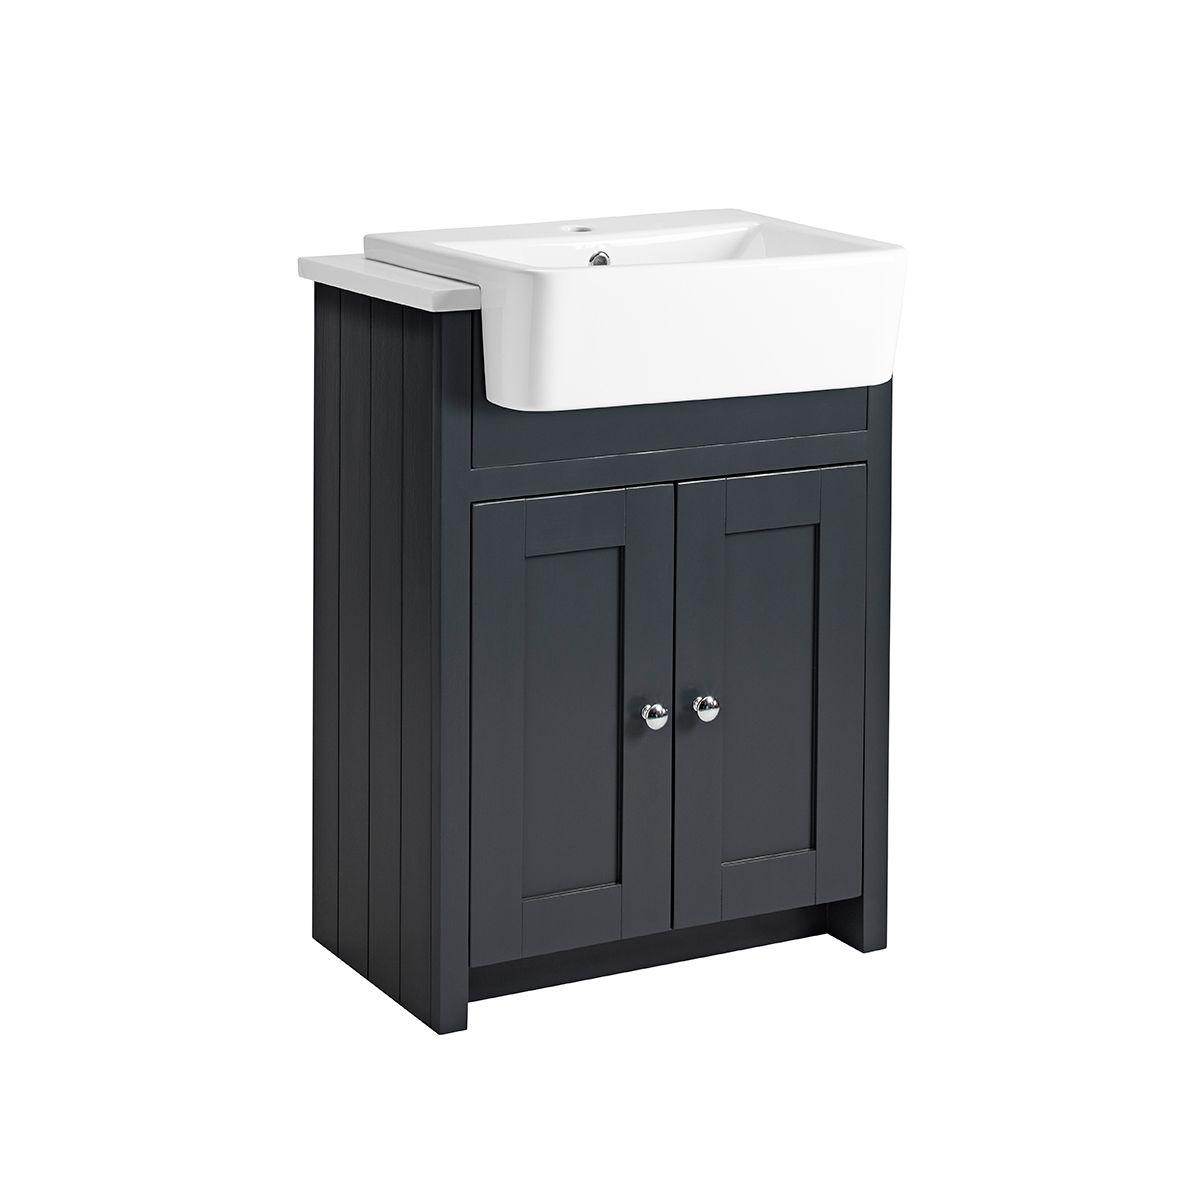 Tavistock Lansdown Semi Countertop, Dark Grey Bathroom Vanity Unit